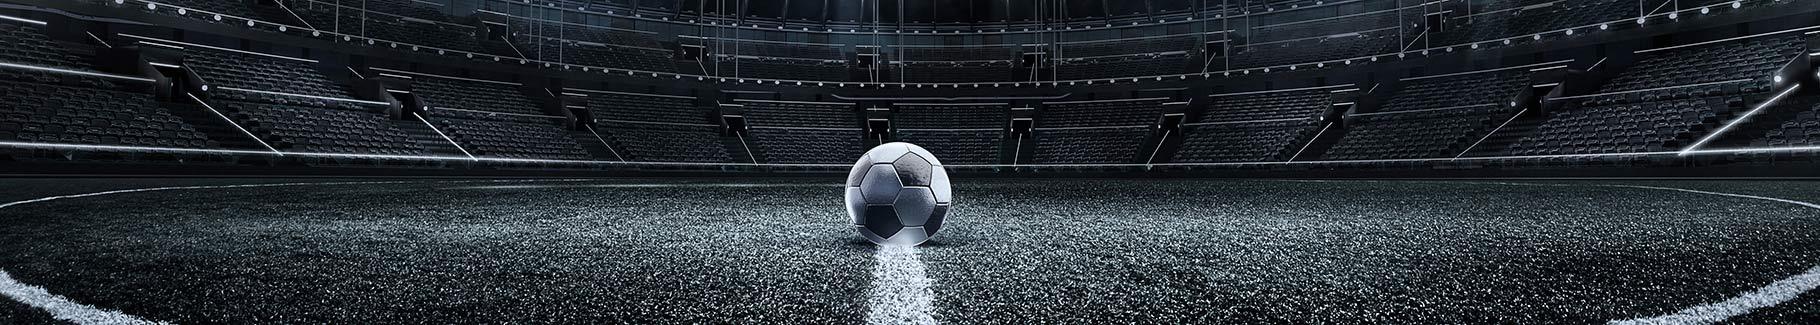 Fototapeta piłka na murawie